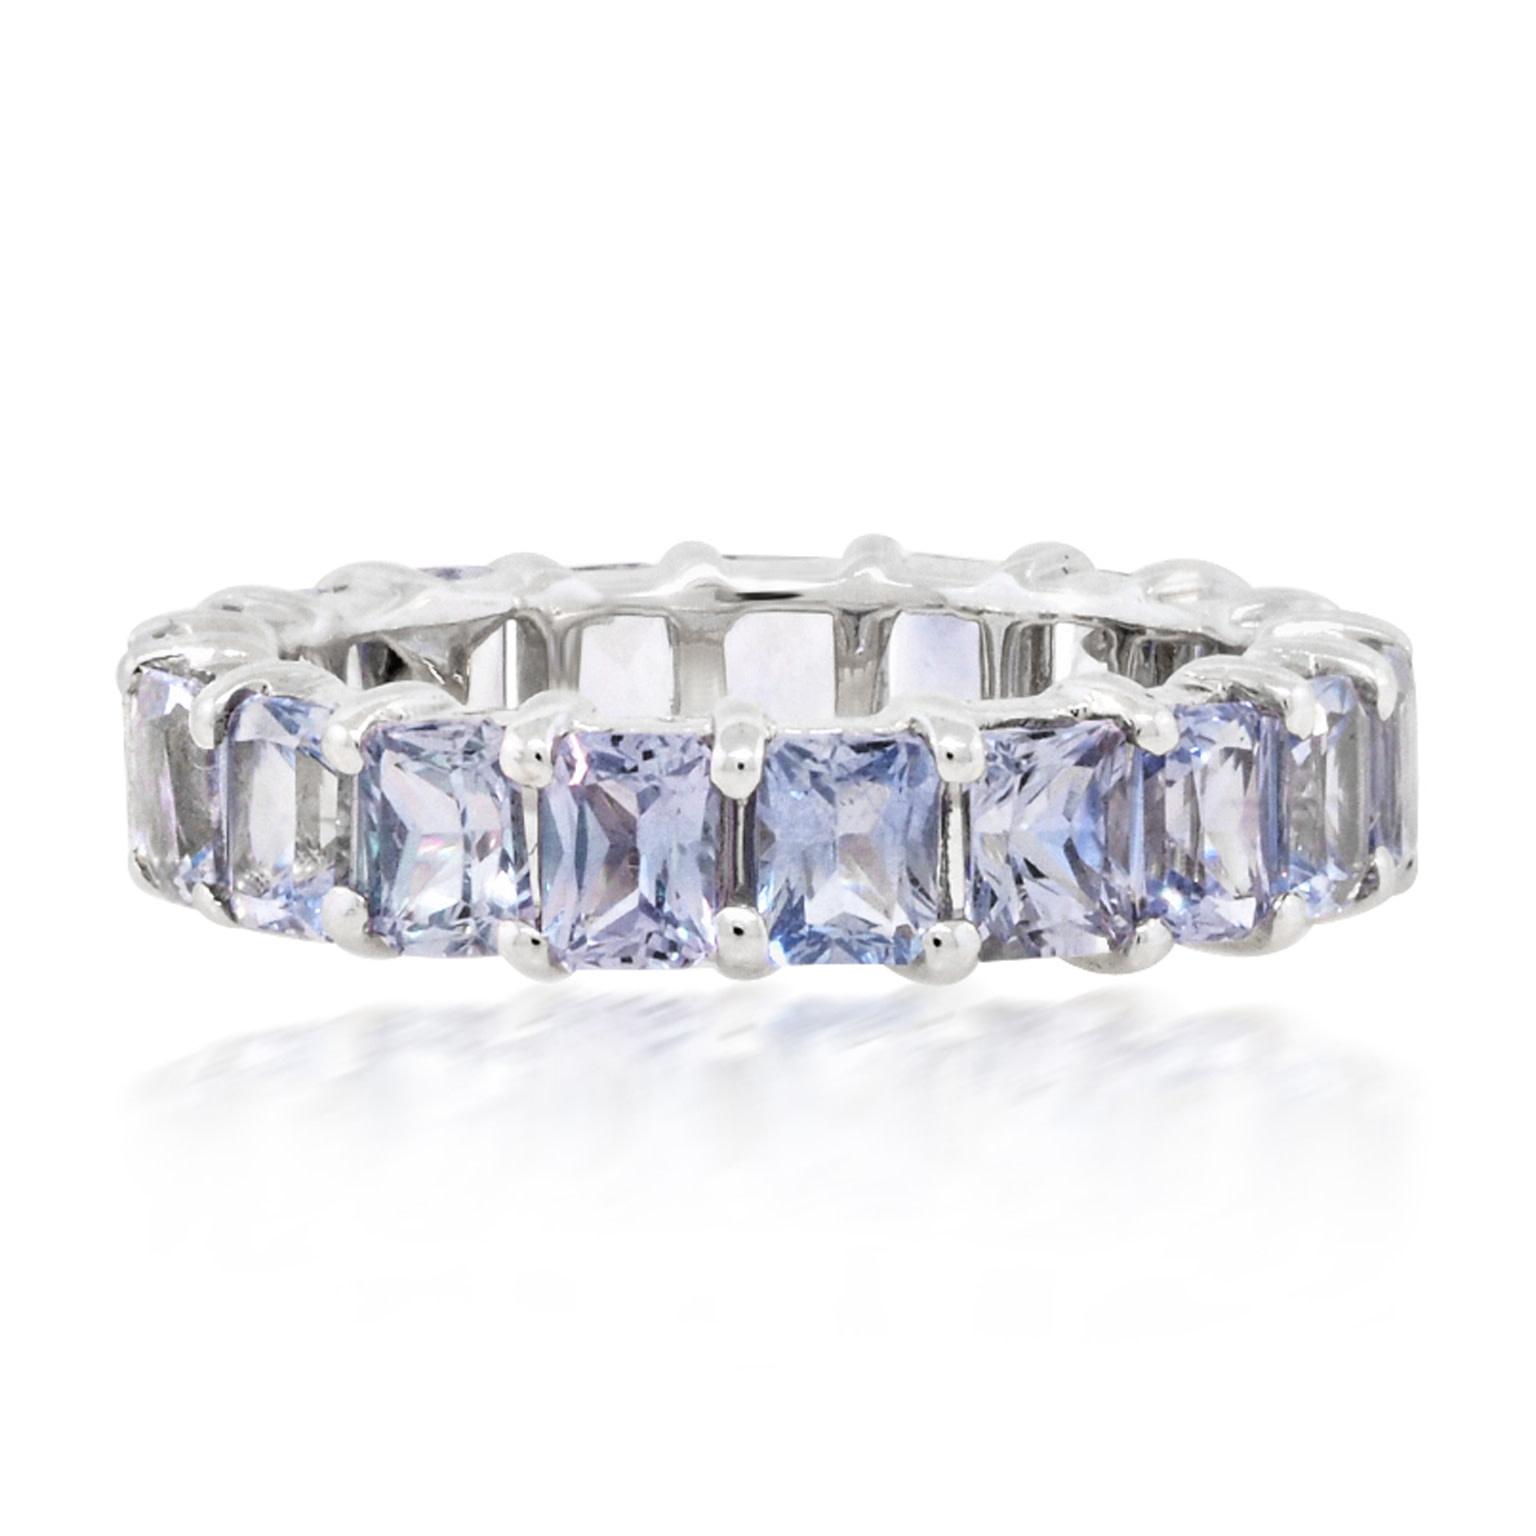 Trabert Goldsmiths Pale Blue Sapphire Eternity Ring